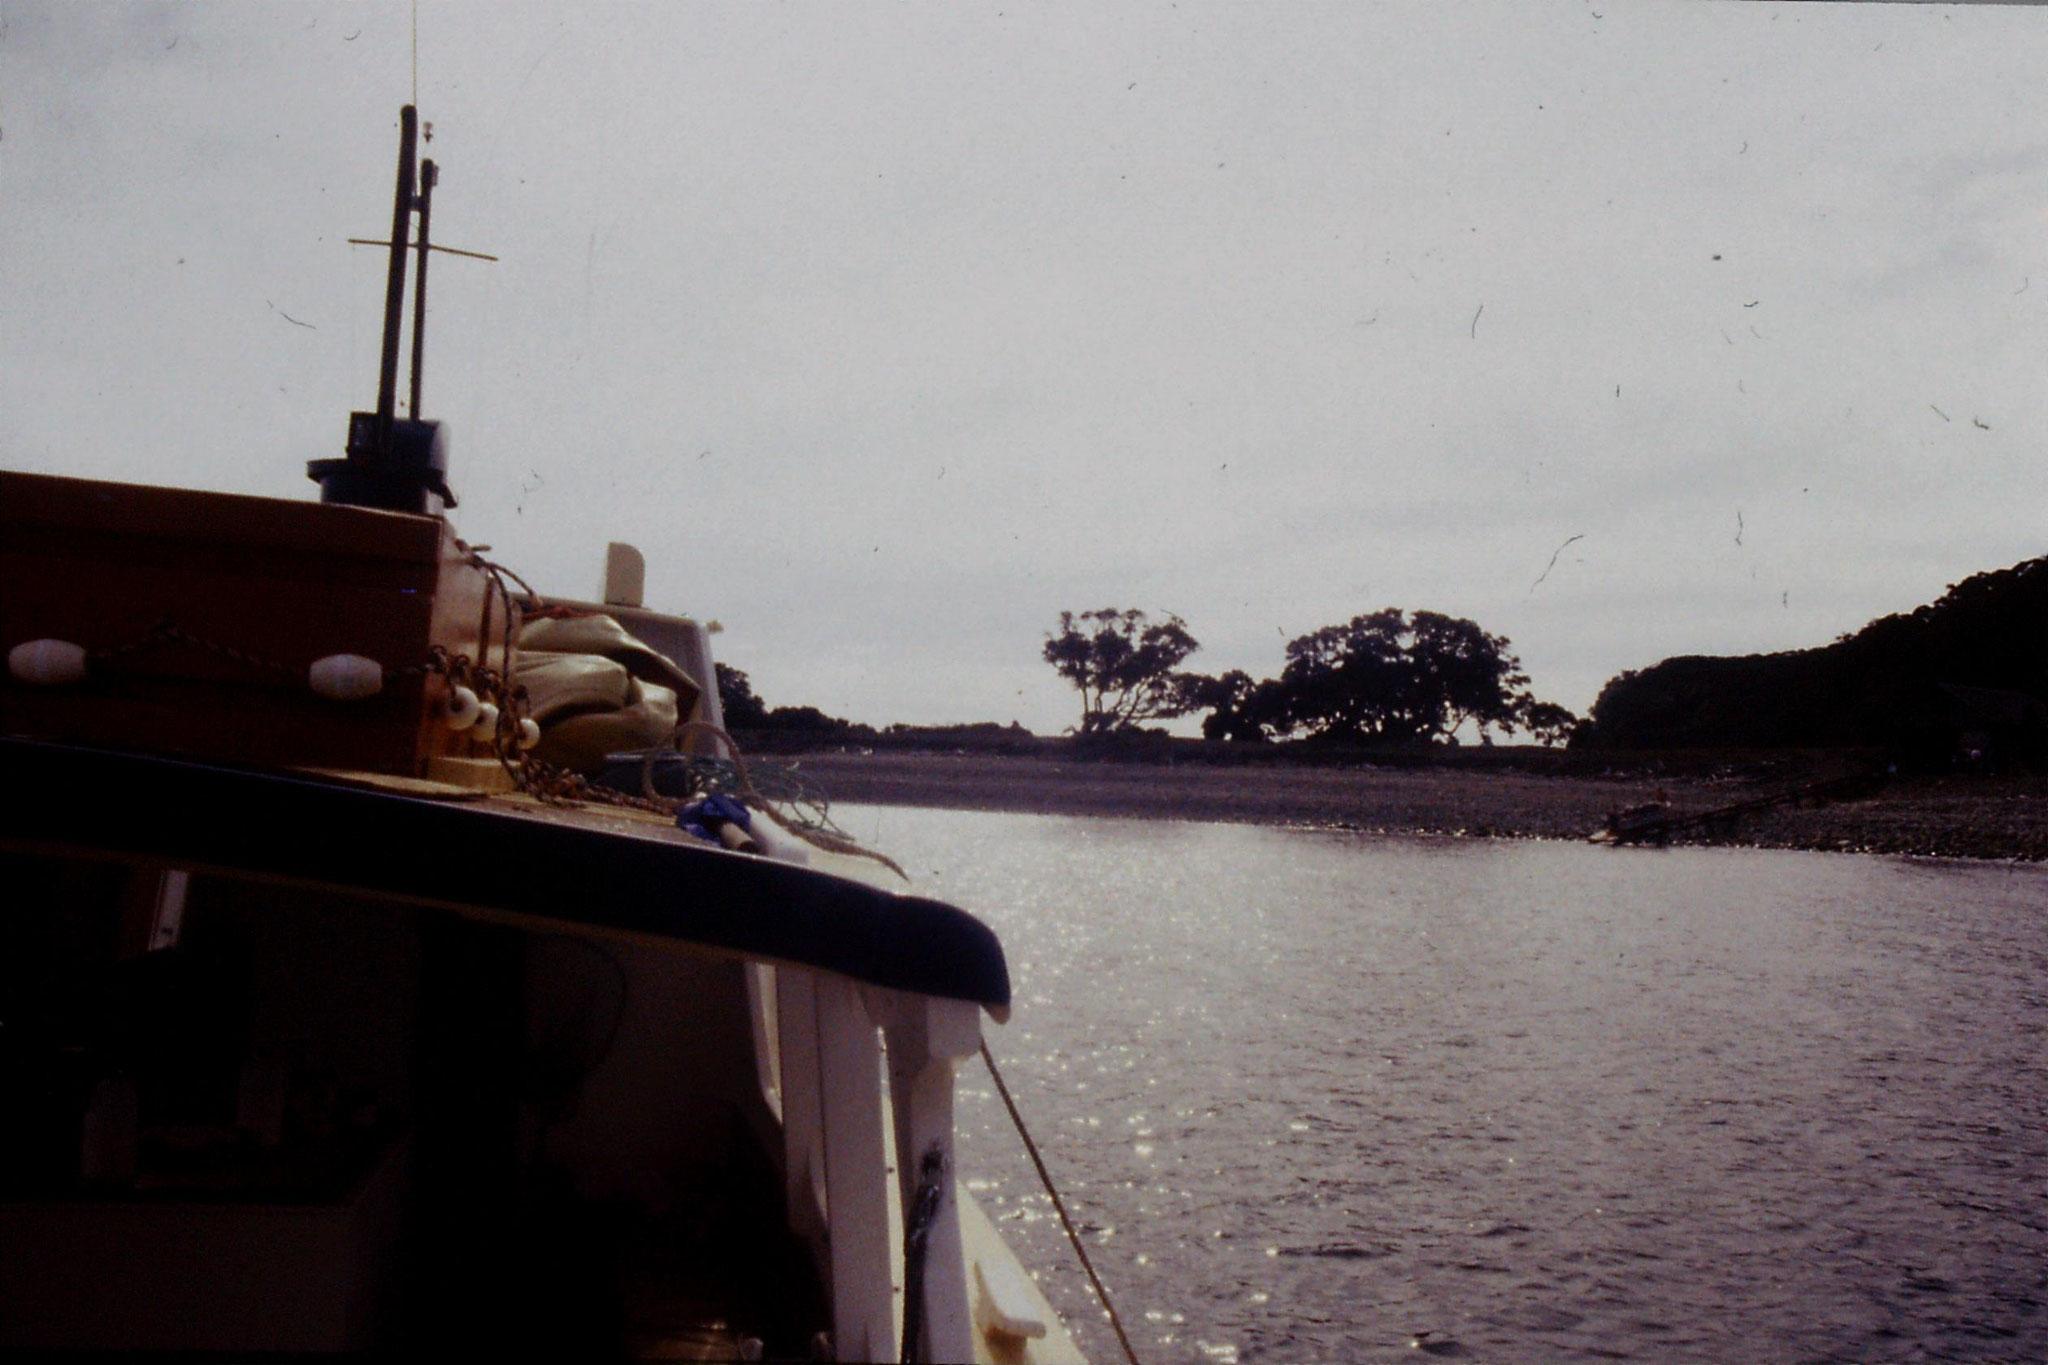 2/9/1990: 15: boat from Little Barrier Is